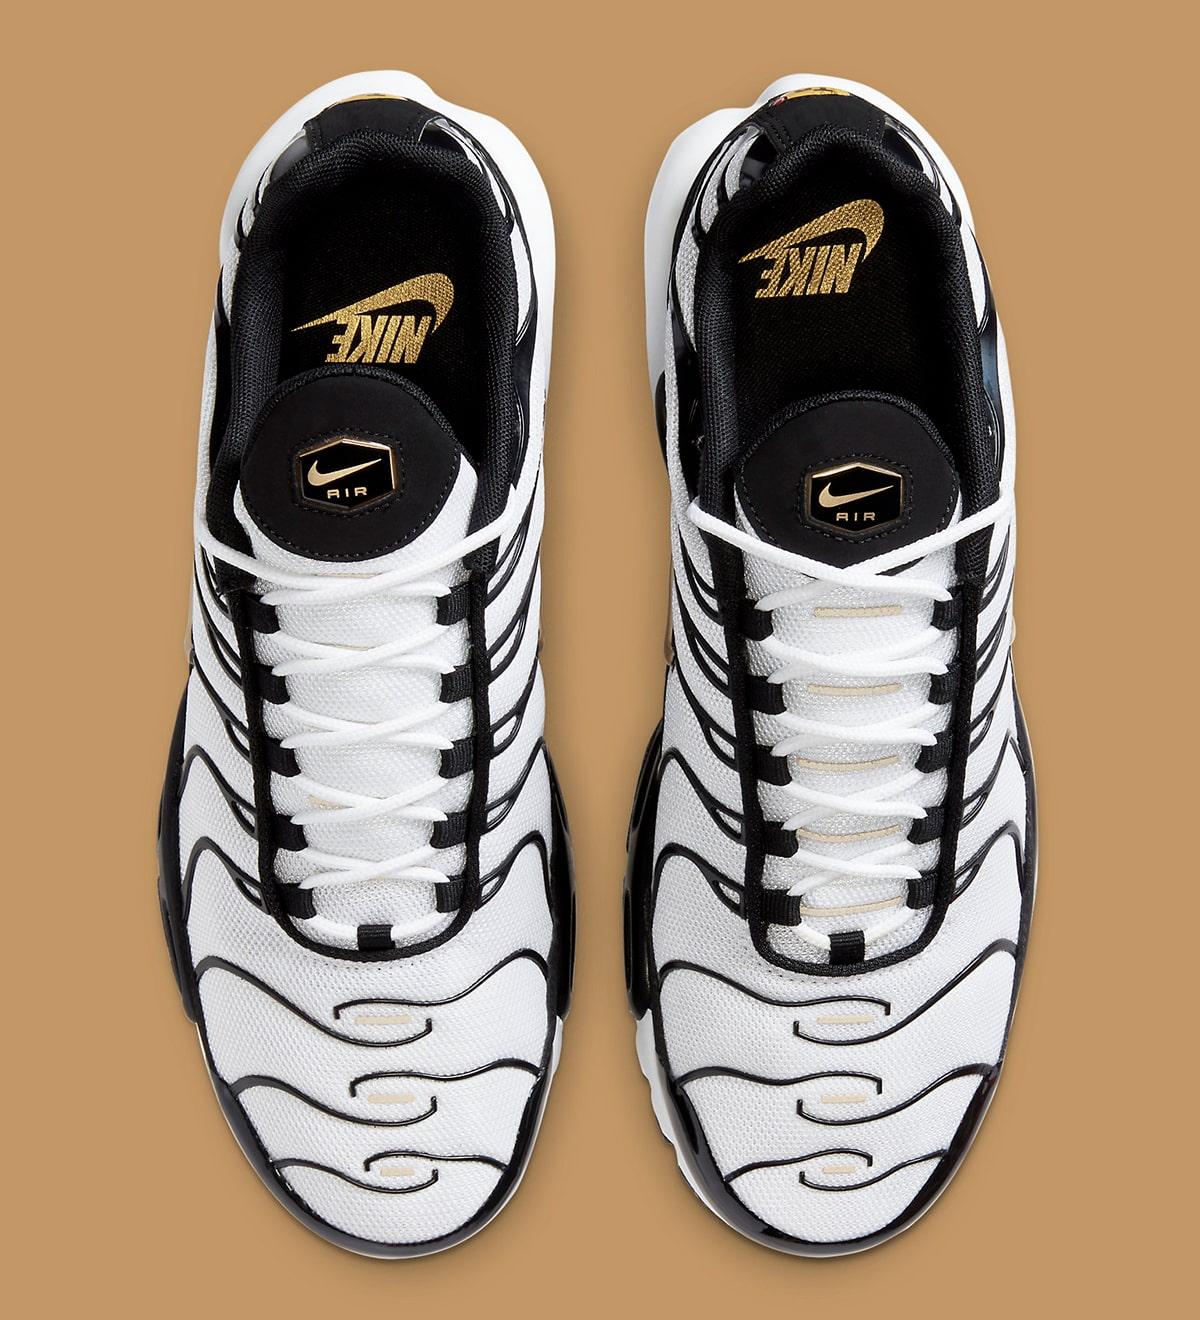 nike-air-max-plus-dmp-white-black-gold-cz9188-001-release-date-info-4